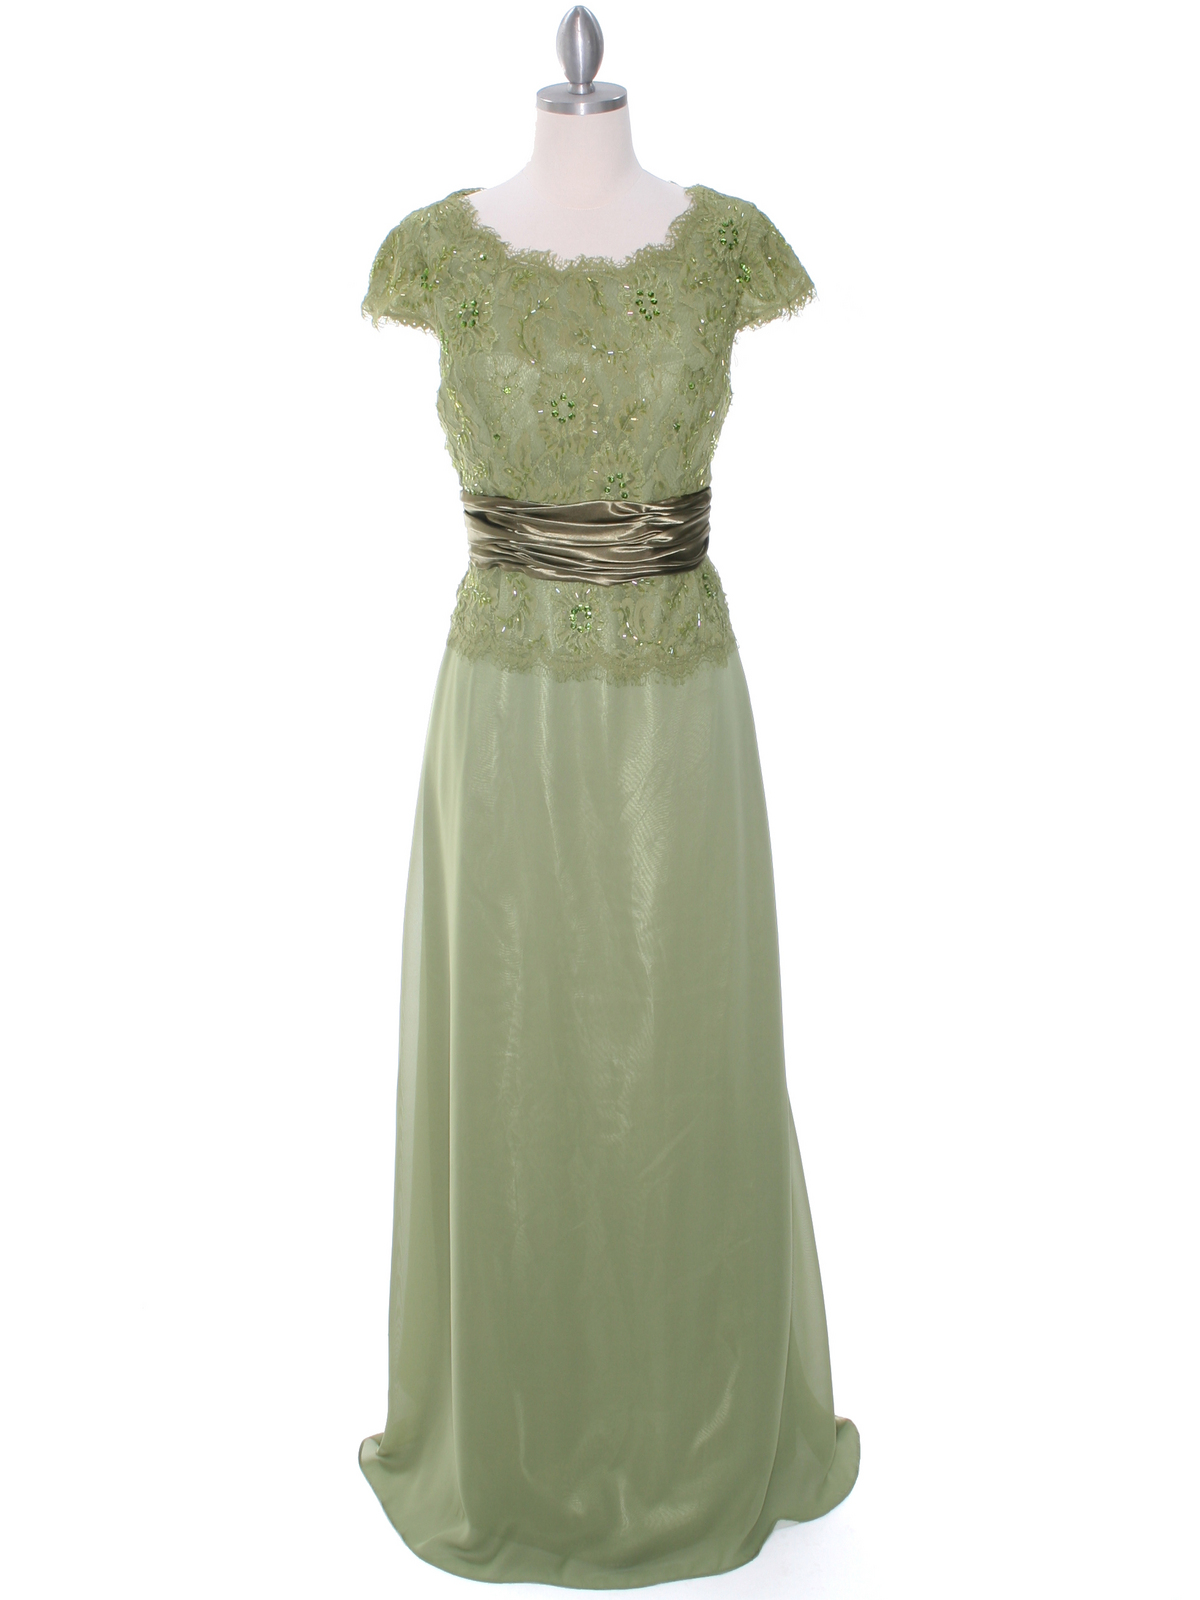 Olive Lace Top Evening Dress Sung Boutique L A